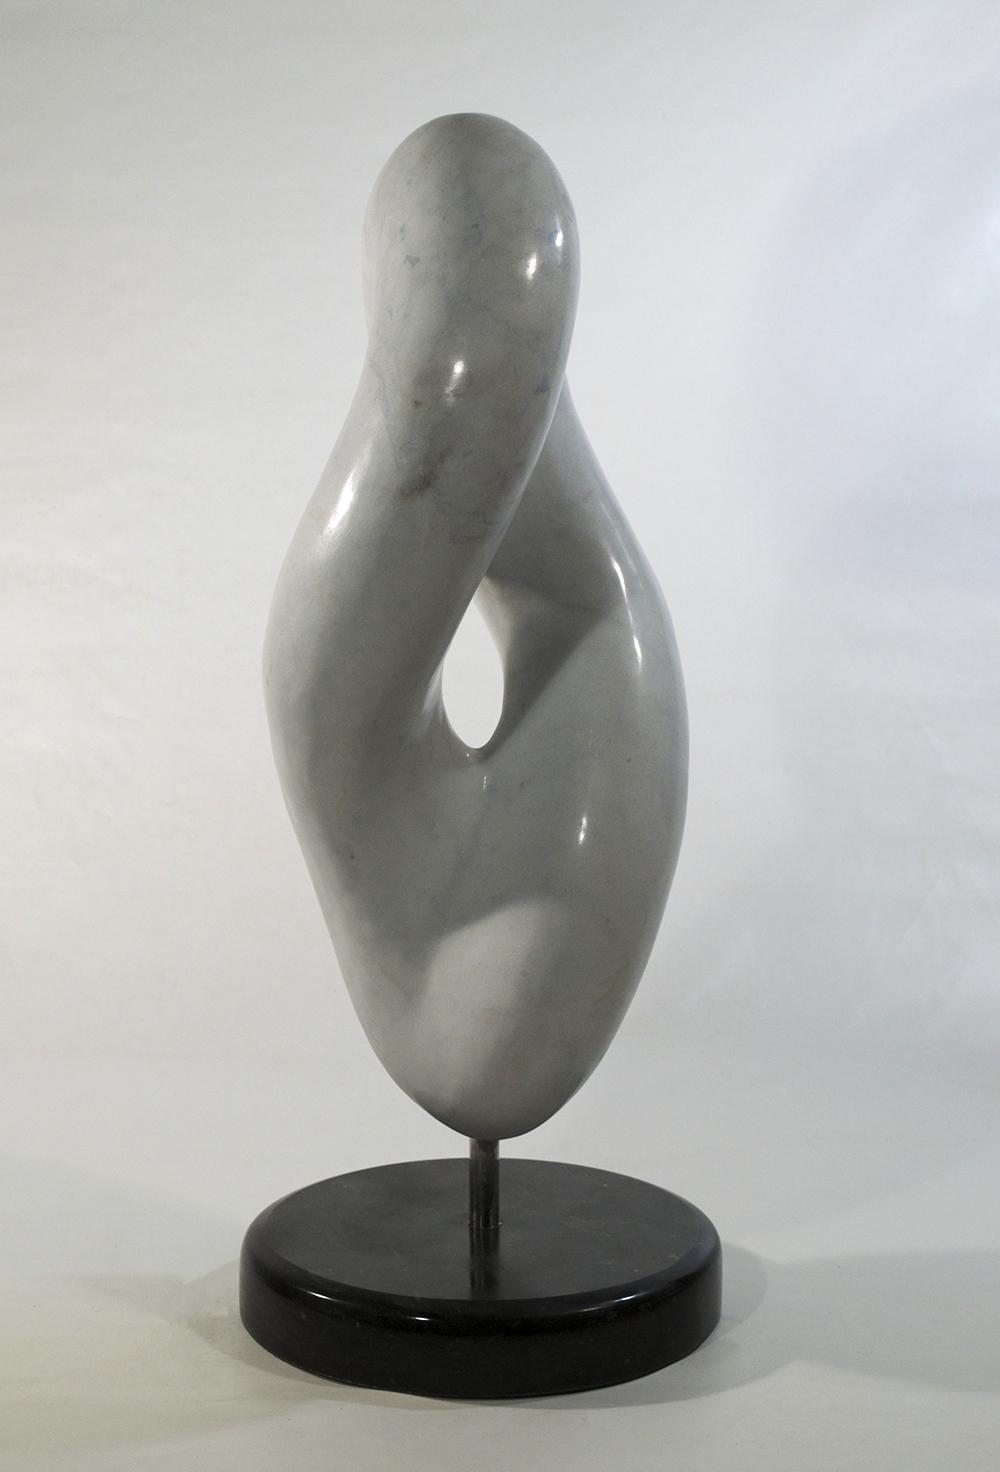 MarbleSculpture_5